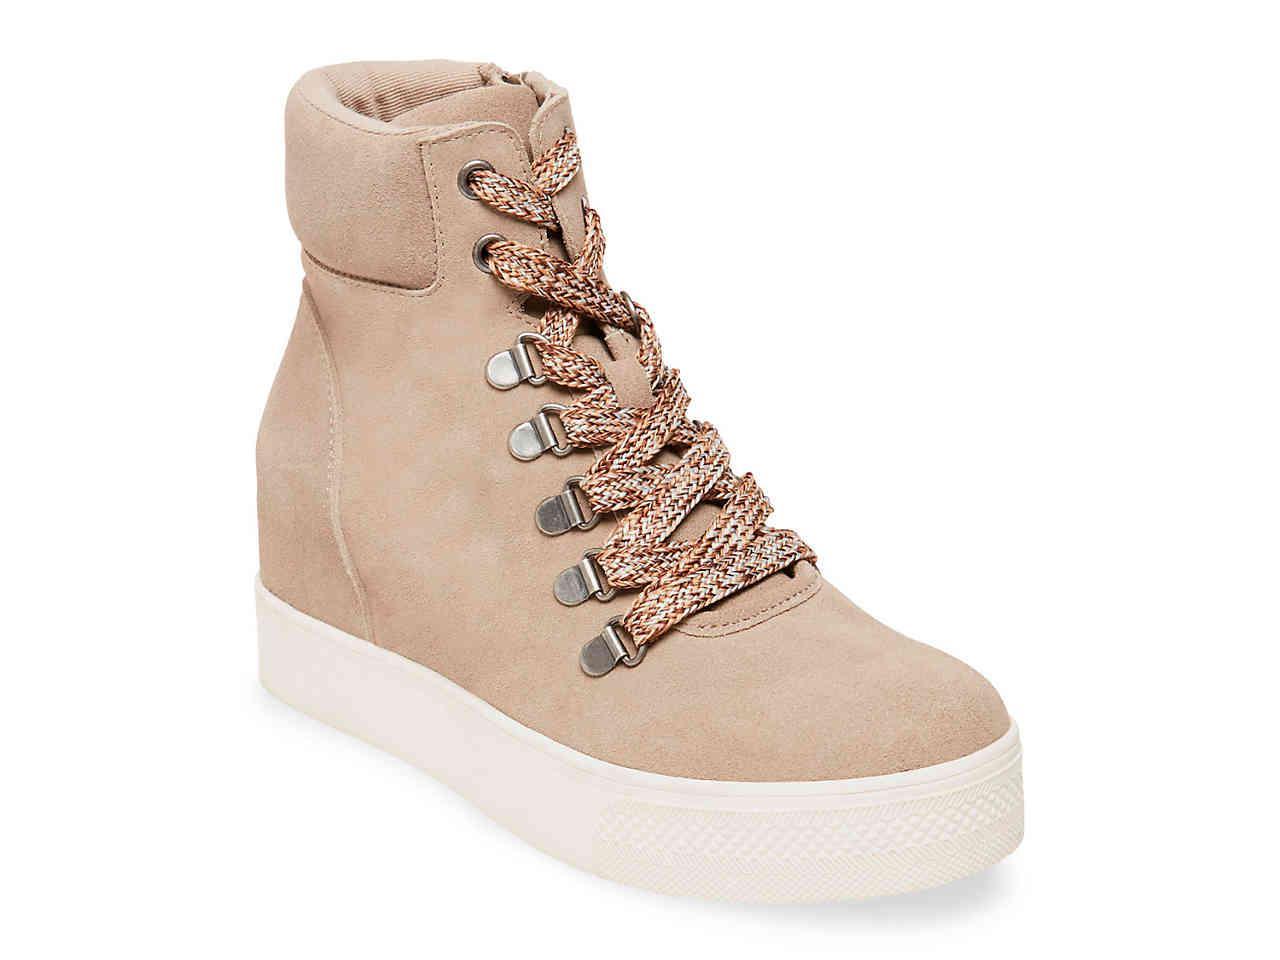 7253e6e01 Lyst - Steve Madden Catch Wedge Sneaker in Natural